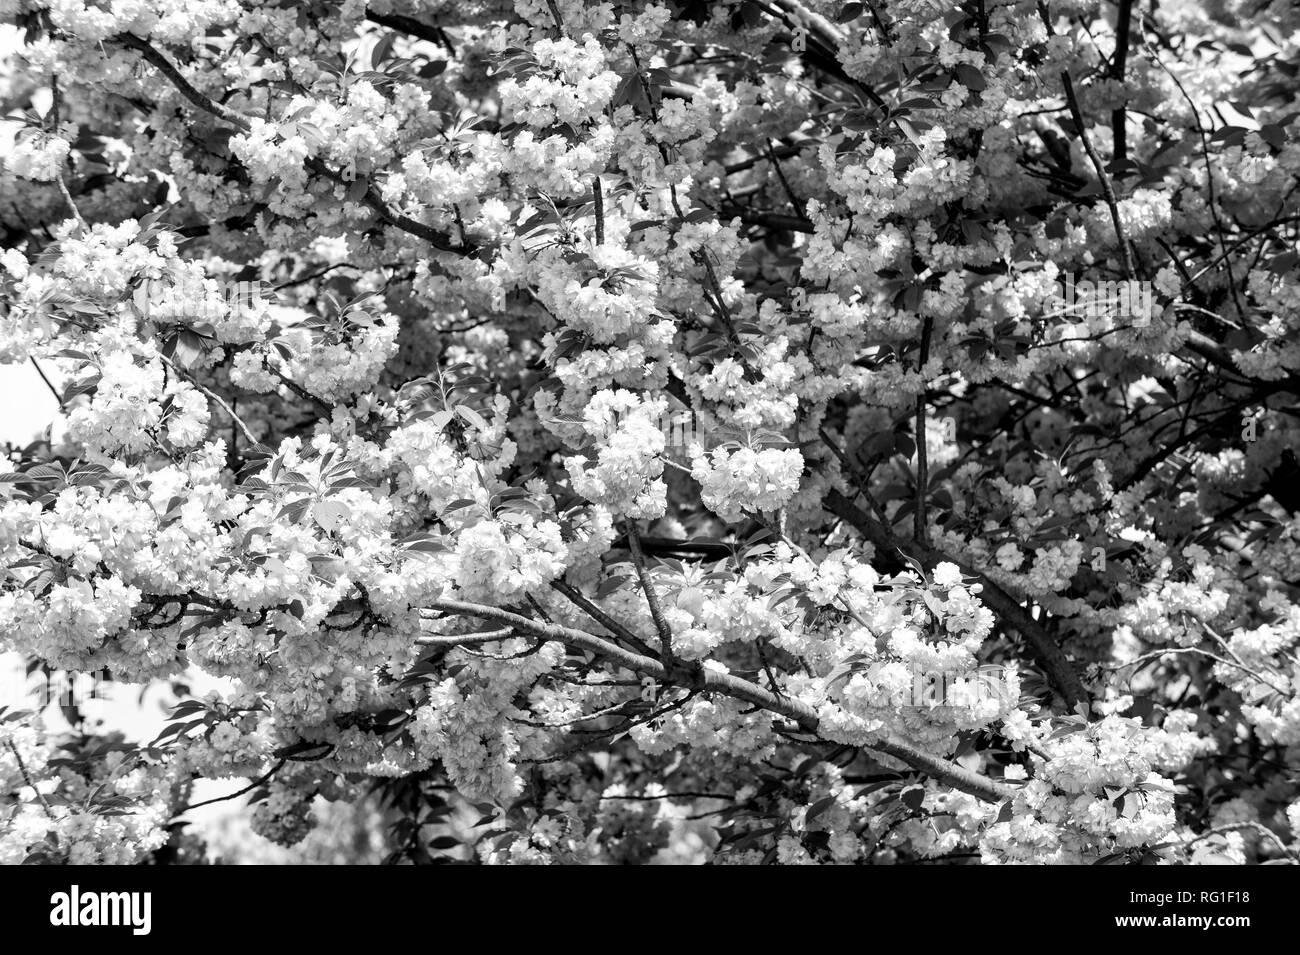 Cherry tree in pink blossom on sunny day. Sakura flowers blossoming in spring. Nature, beauty, environment. Sakura blooming season concept. Renewal, rebirth, new life awakening. - Stock Image